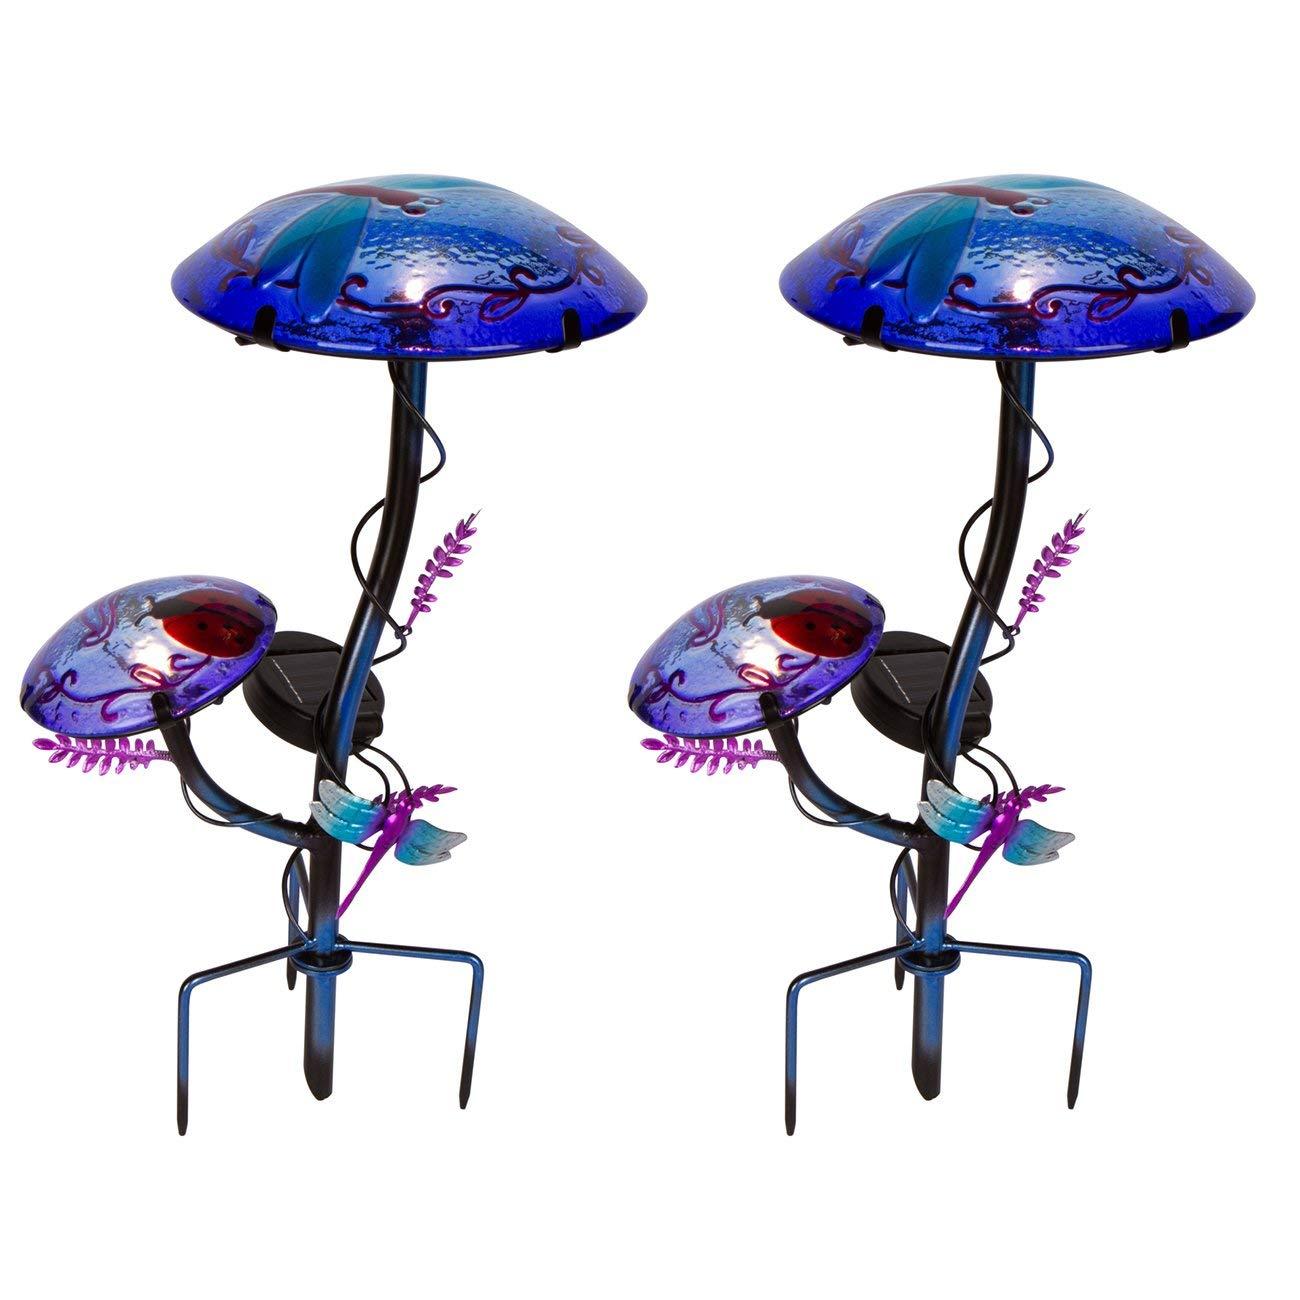 "12"" Solar Mushroom Garden Stake with Dragonfly Design by Trademark Innovations (Purple, Set of 2)"